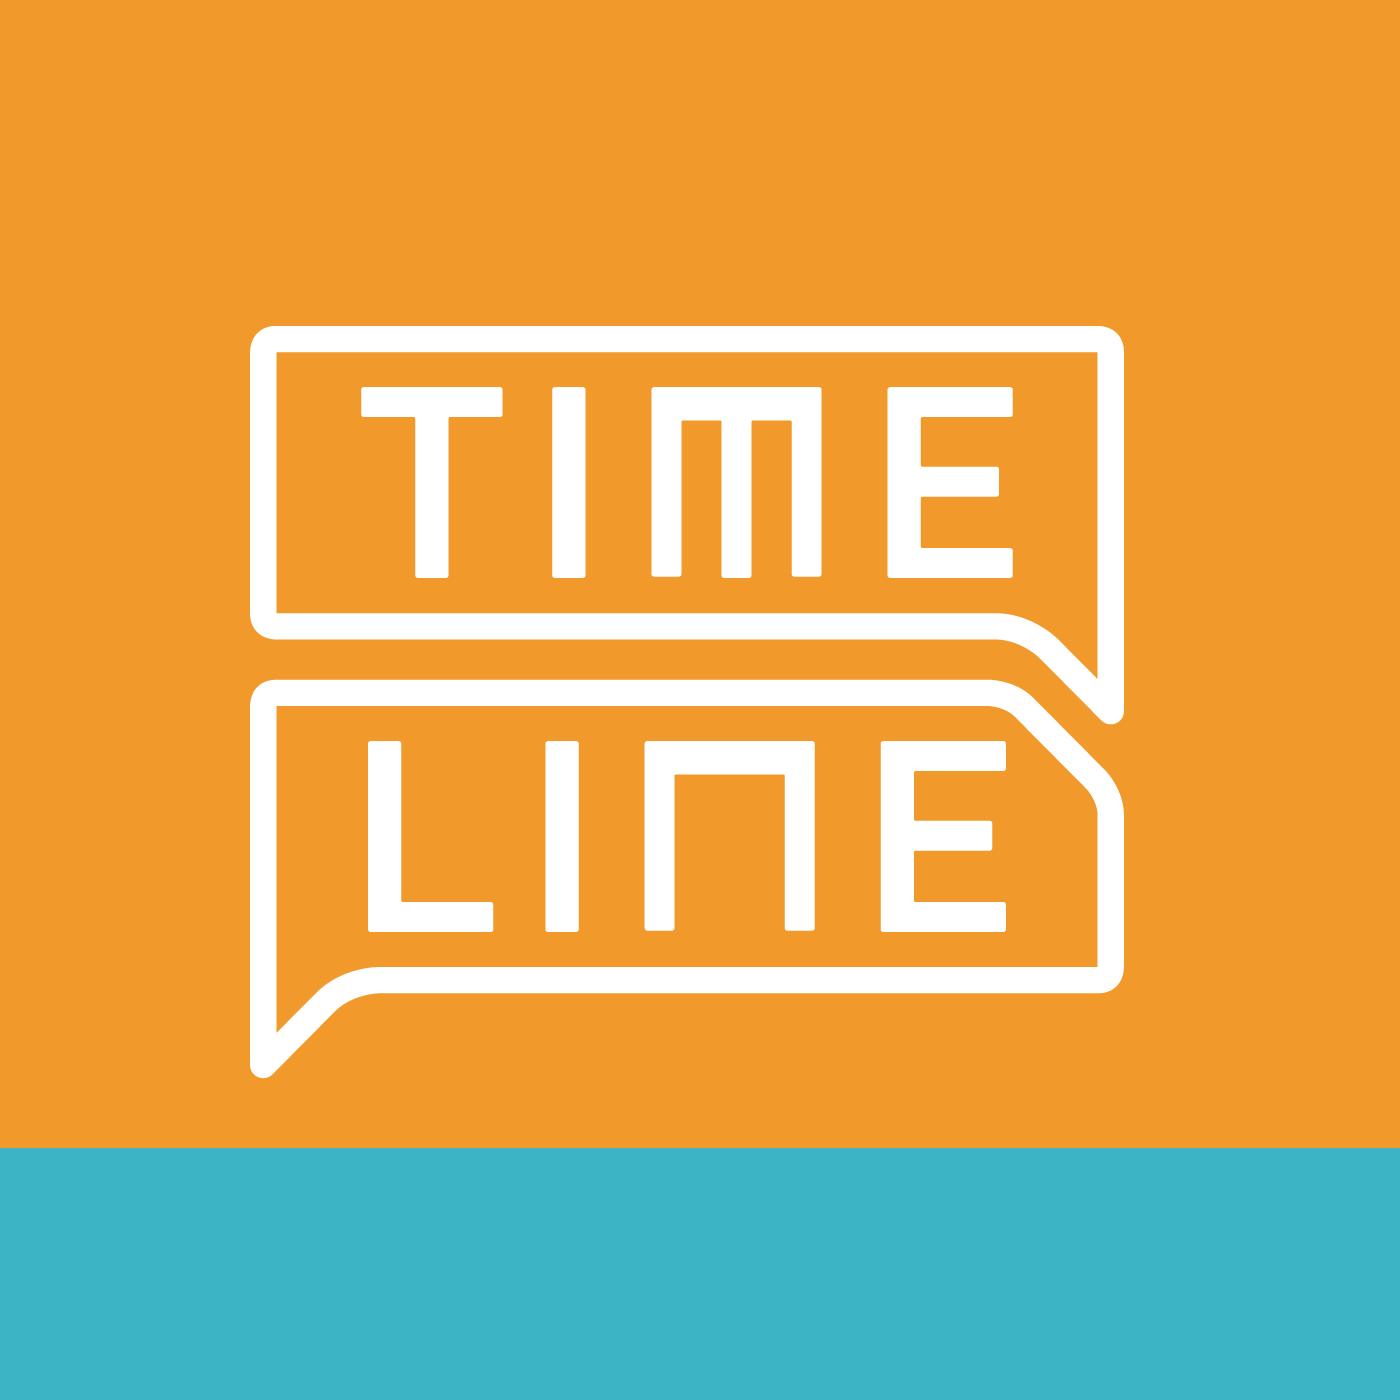 Timeline Gaúcha 23.03.2018